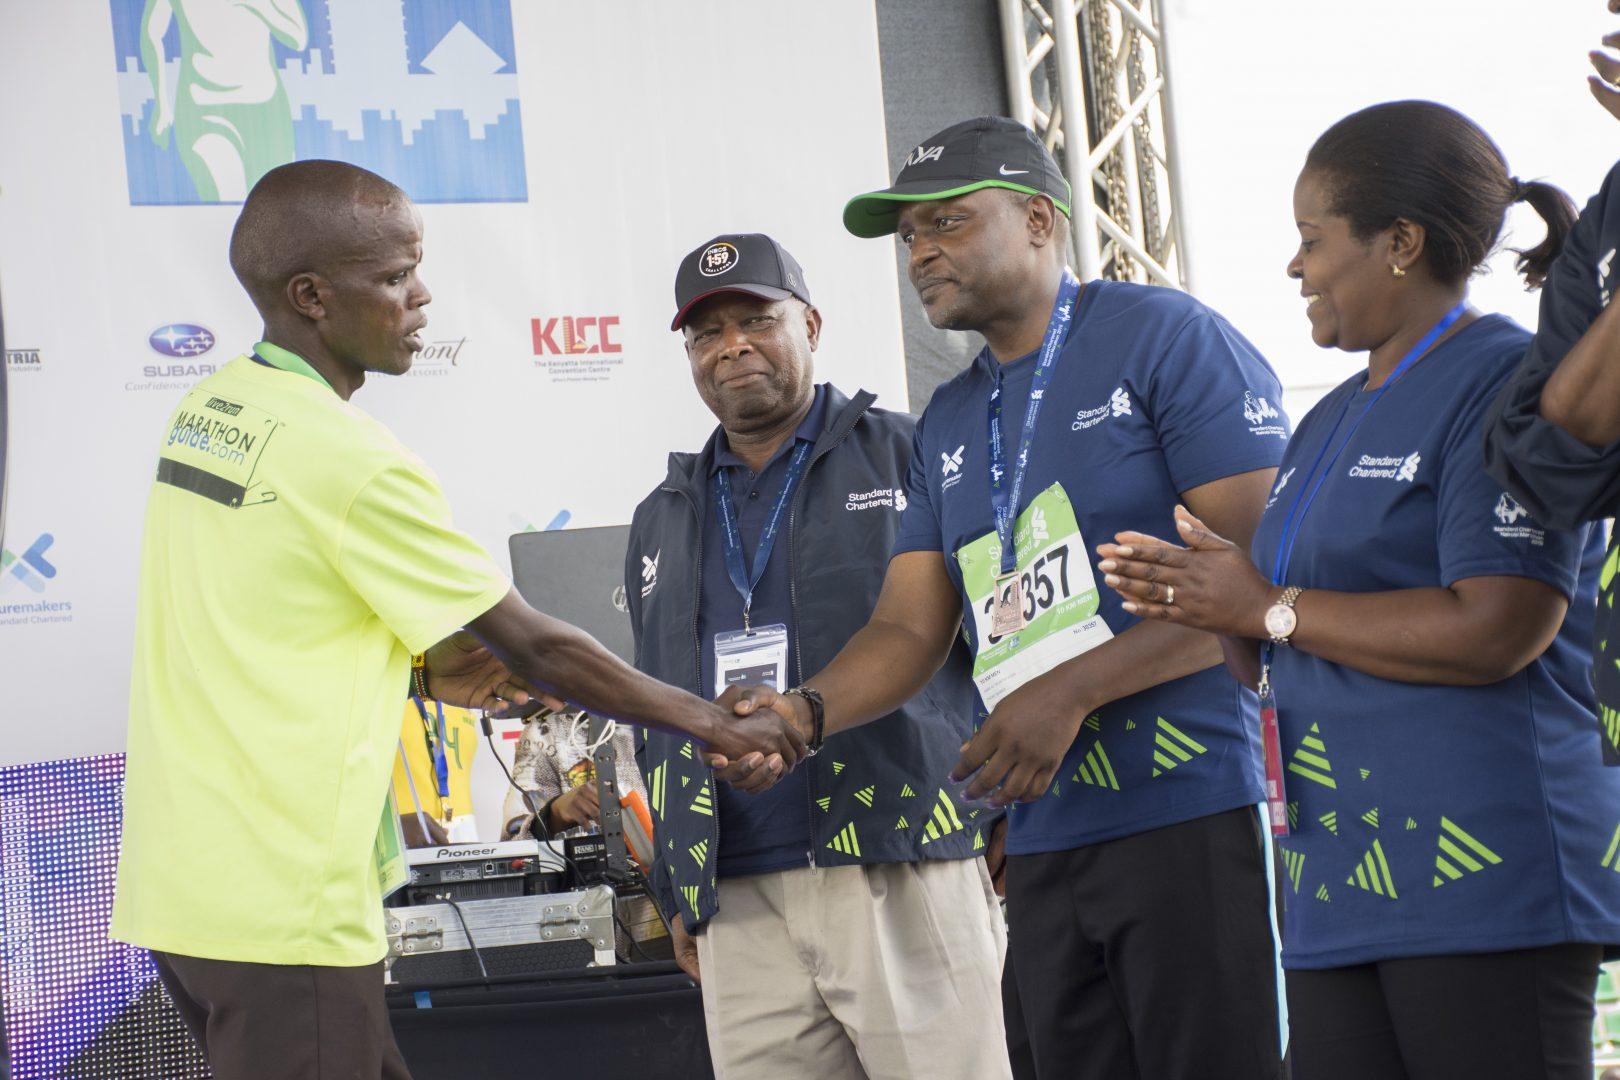 https://www.nairobimarathon.com/wp-content/uploads/2021/07/DSC_3292.jpg